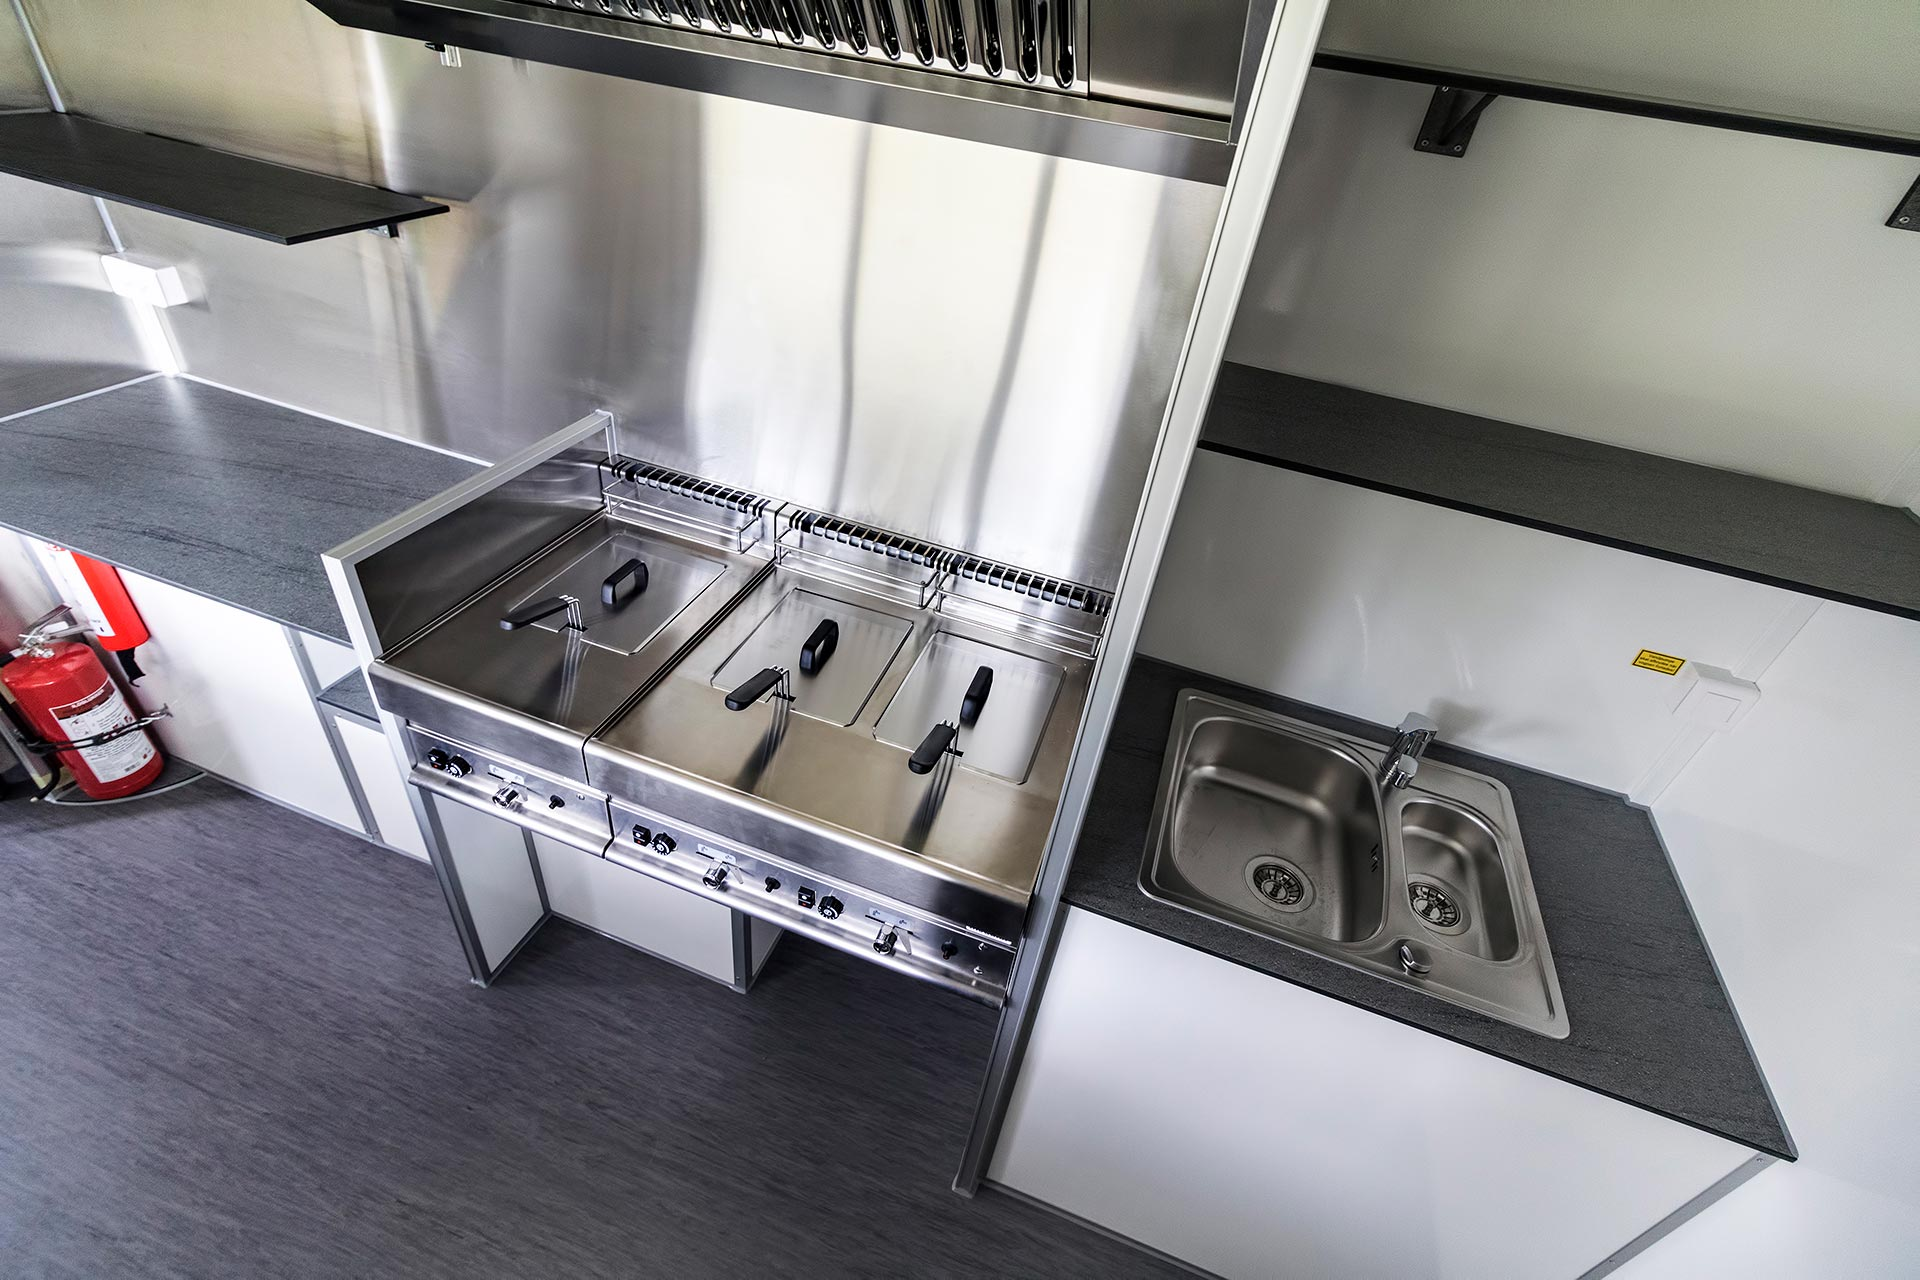 Salgsvogn køkken